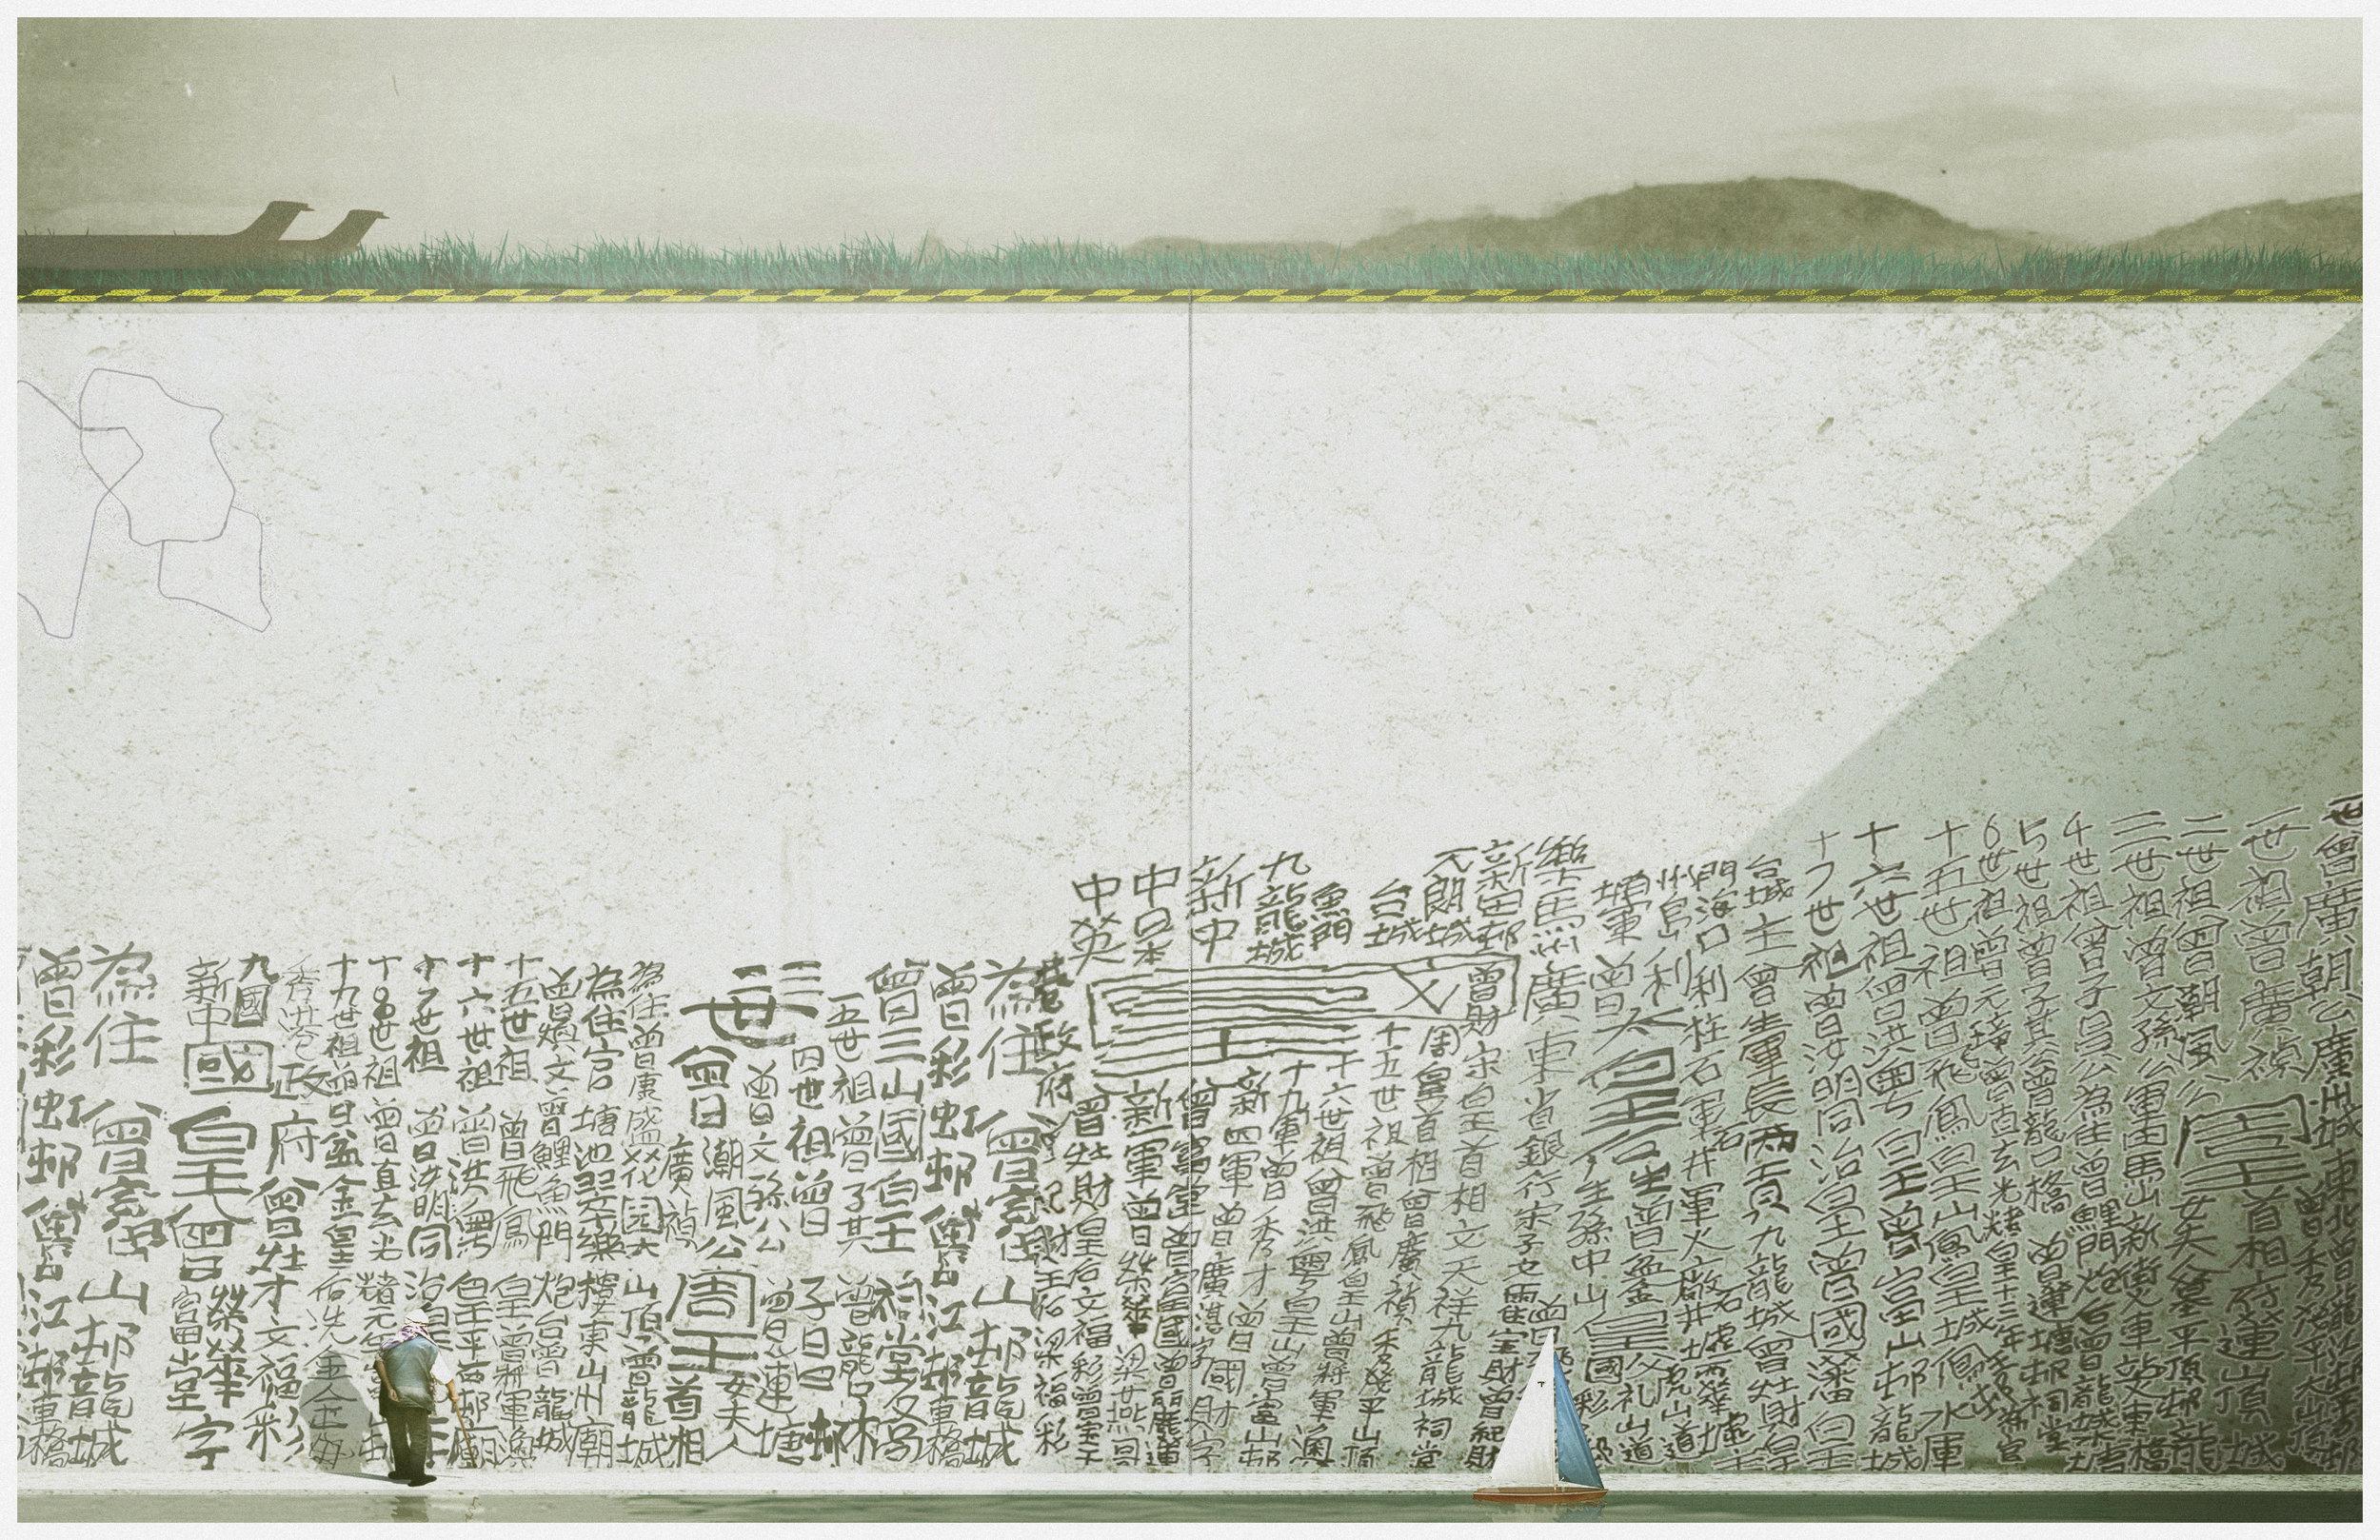 king-of-kowloon-03